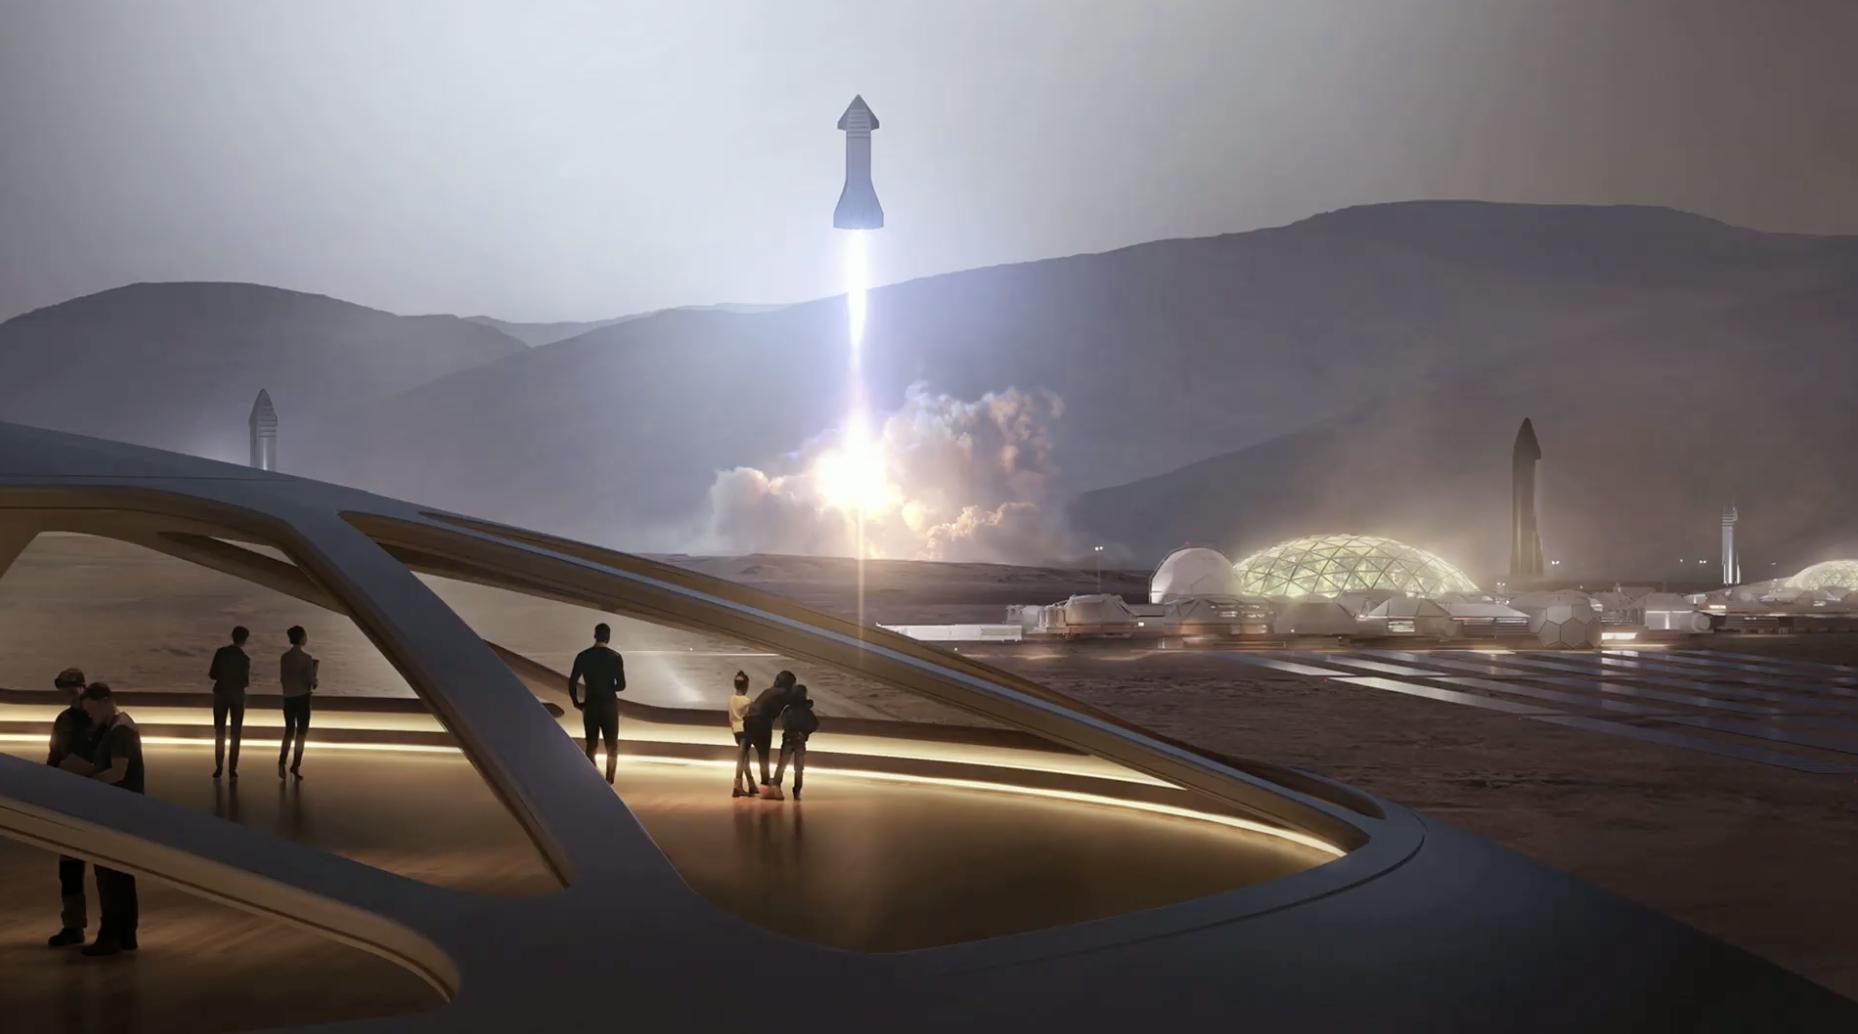 Elon Musk Tweets Starship Updates, Images of 3 Raptor Engines